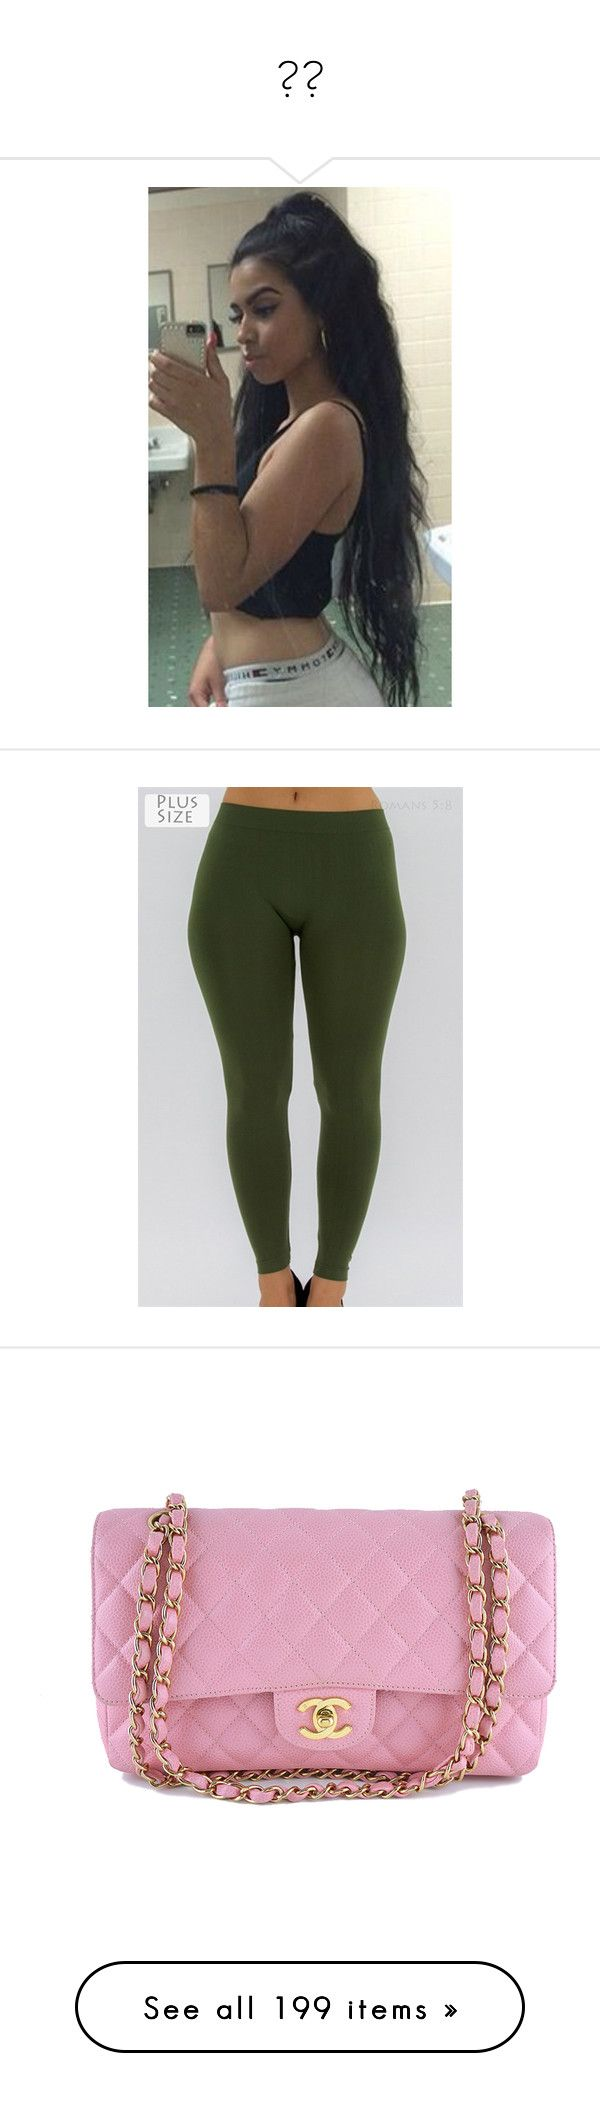 """✨🍃"" by melaninmonroee ❤ liked on Polyvore featuring pants, leggings, womens plus pants, military green pants, plus size womens leggings, olive pants, army green pants, bags, handbags and pink"